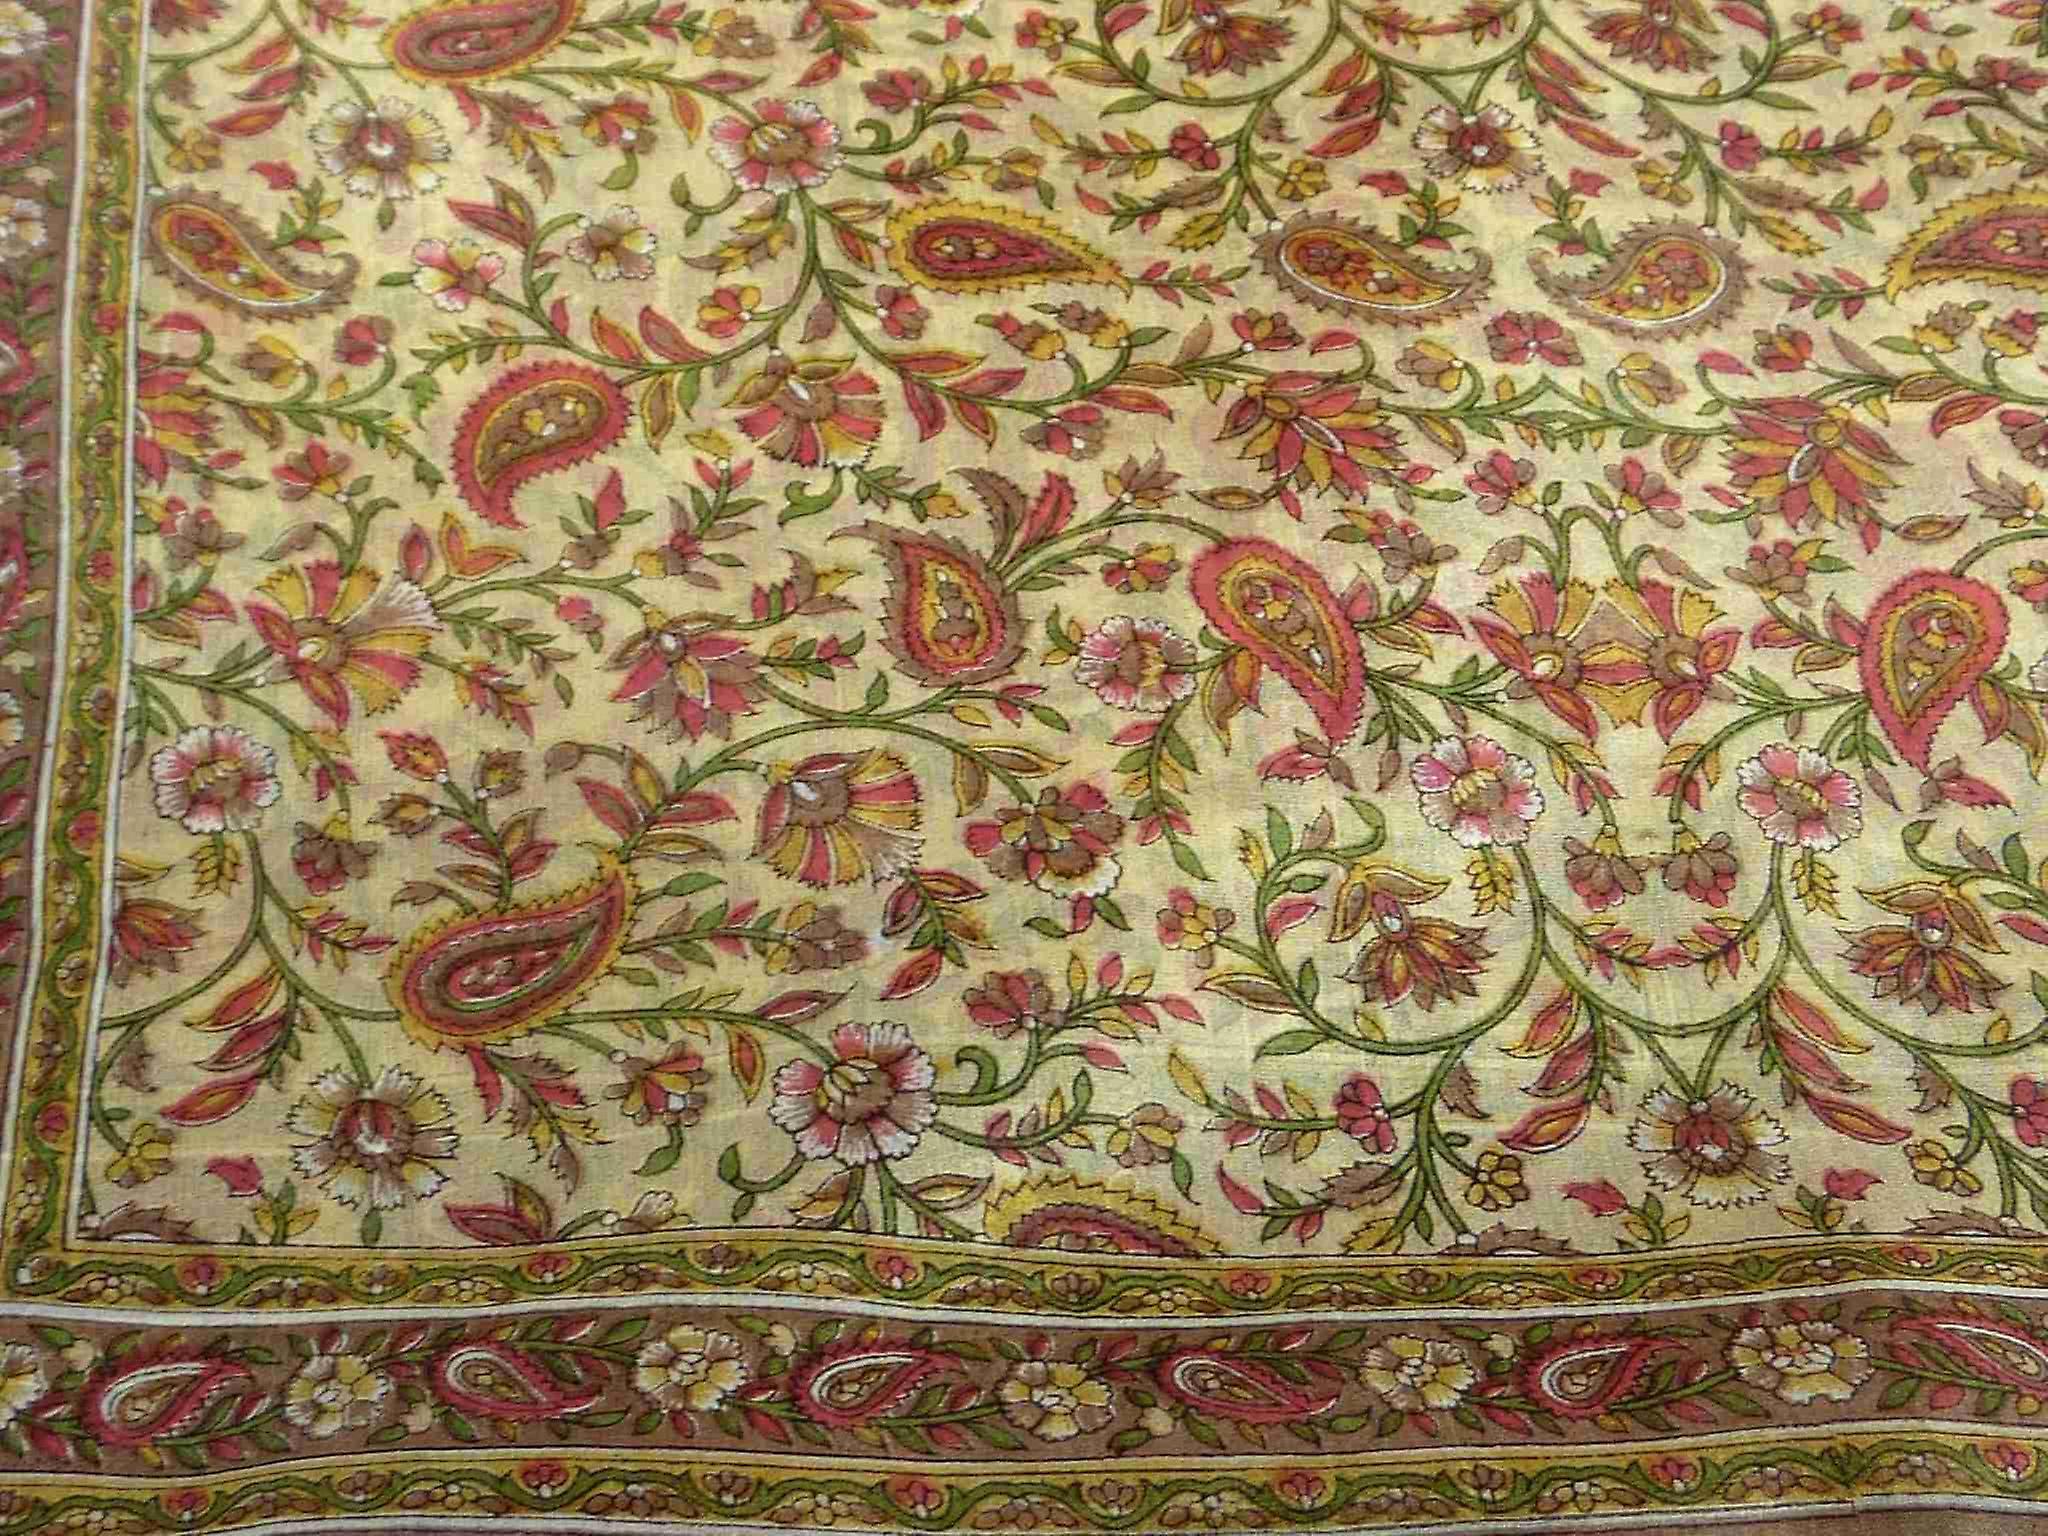 Mulberry Silk Traditional Long Scarf Zain Caramel by Pashmina & Silk